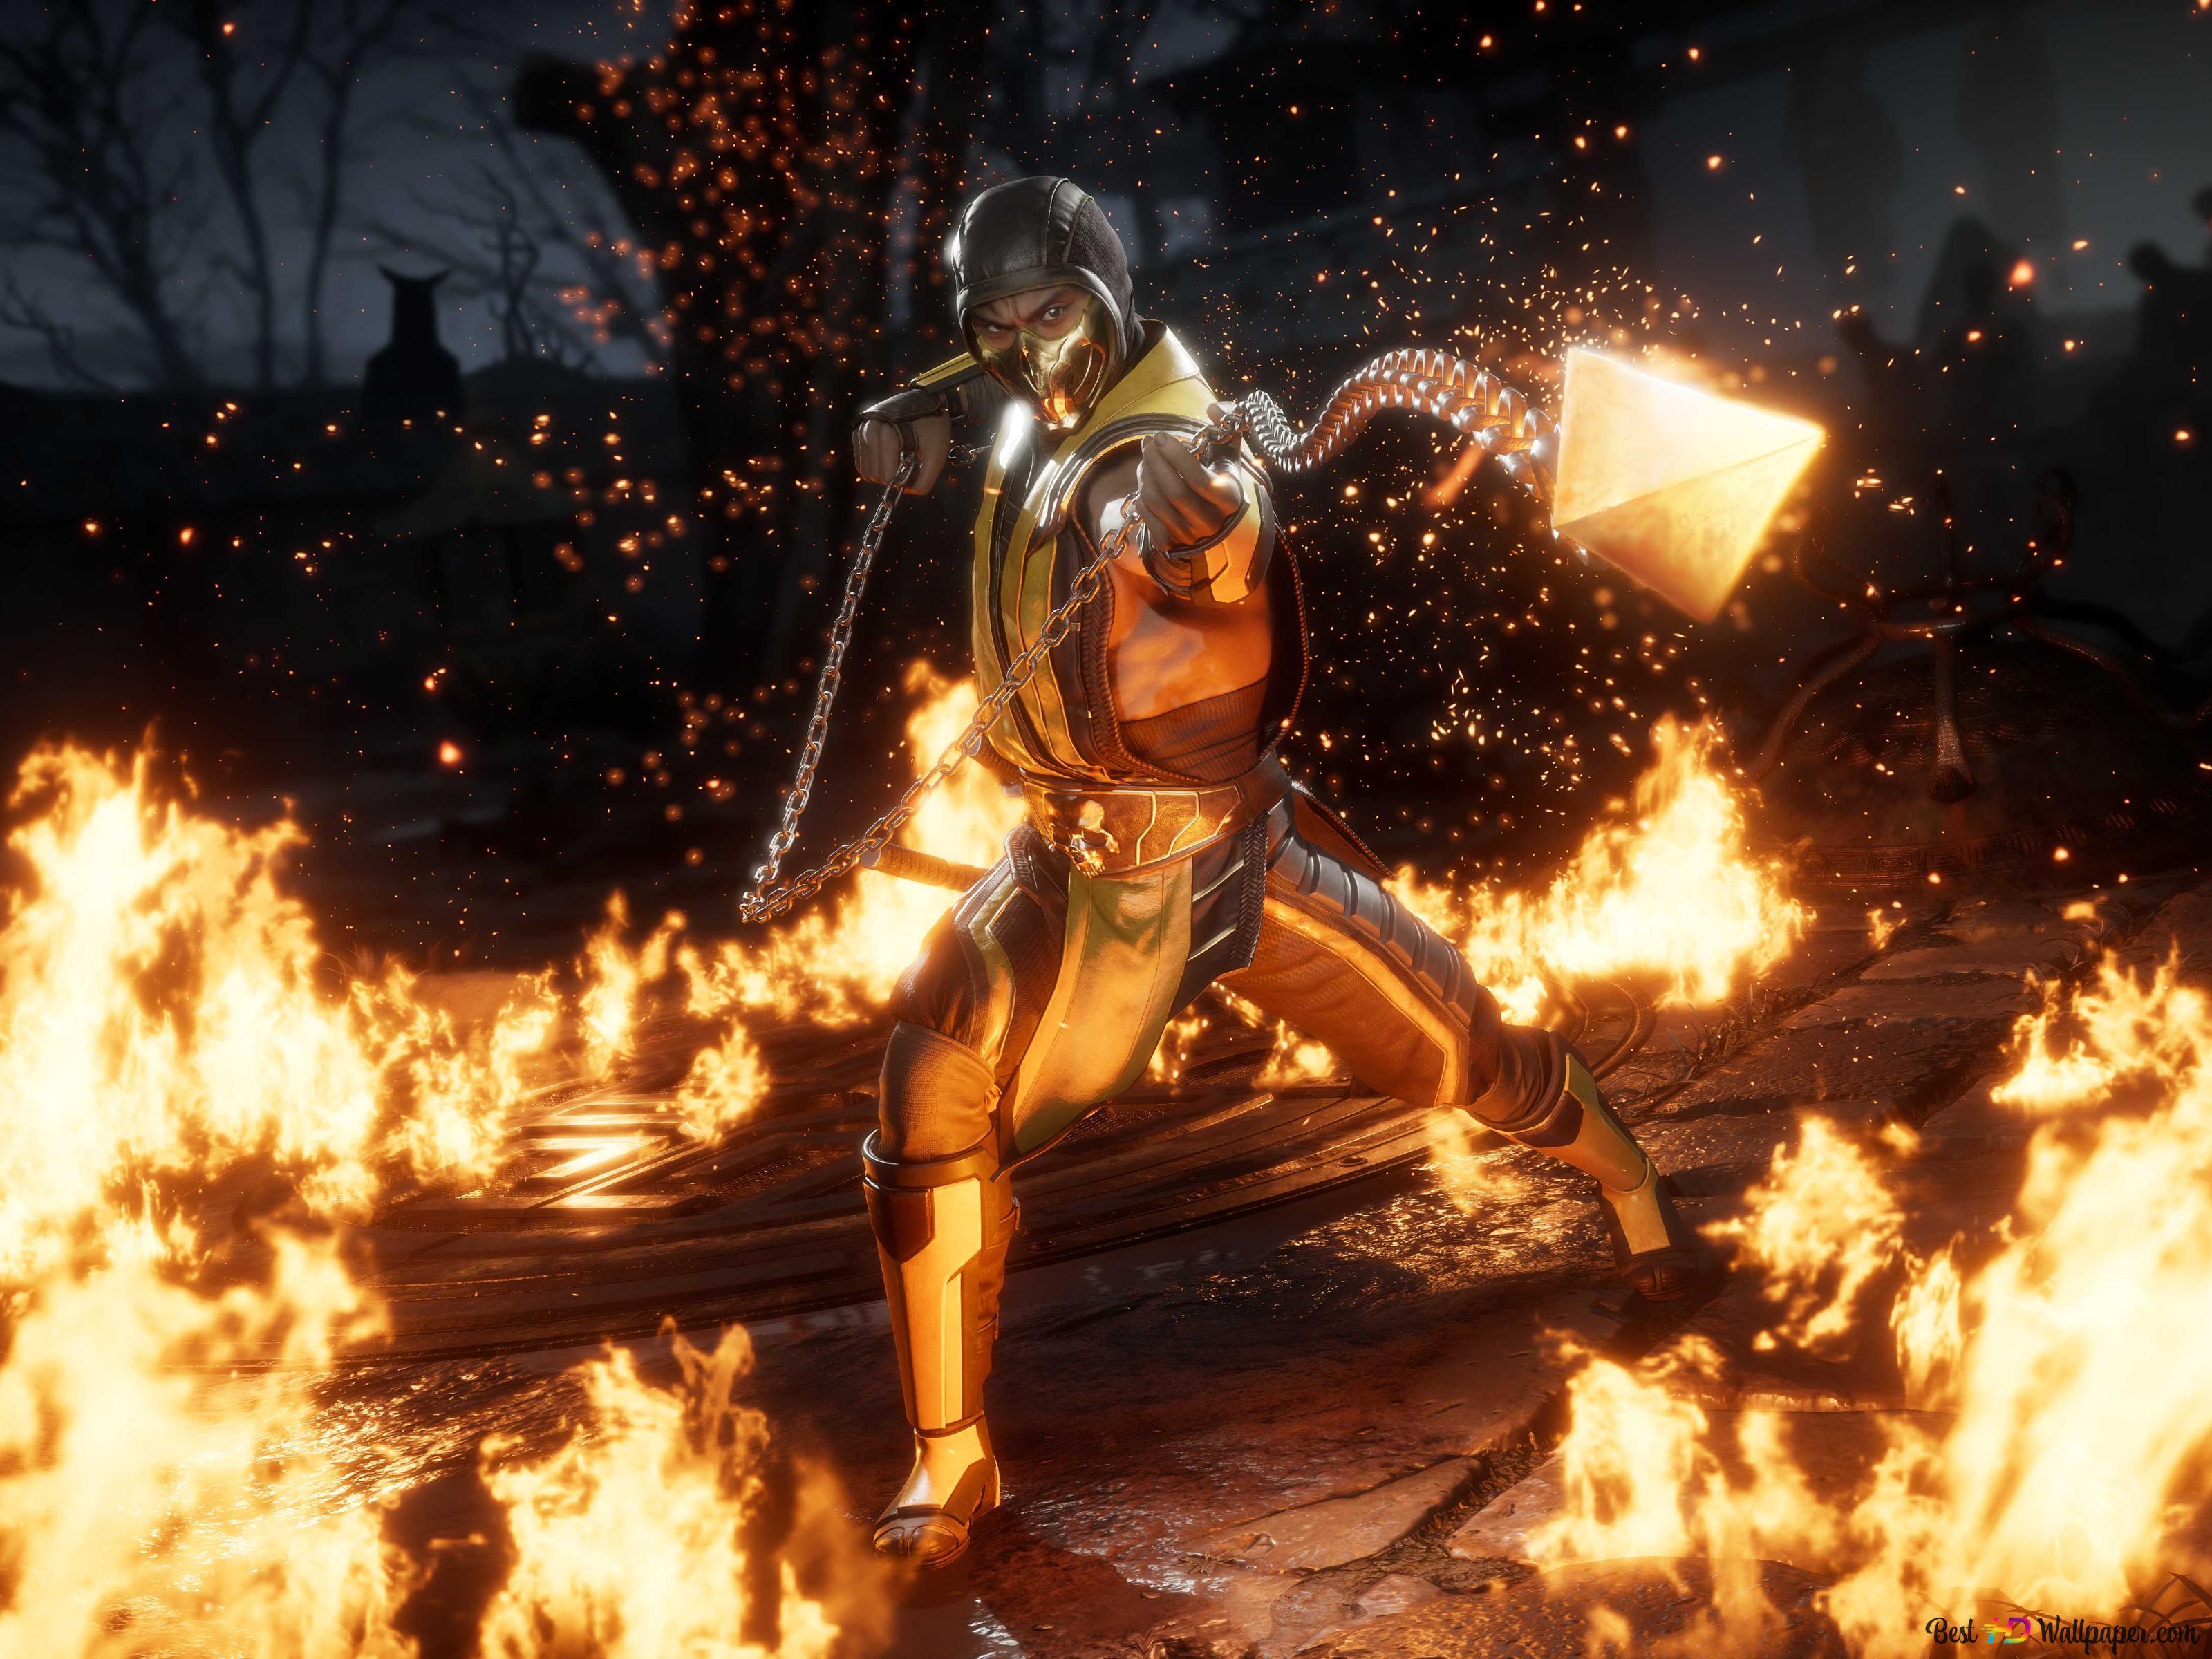 Mortal Kombat 11 2019 Scorpion Hd Hintergrundbilder